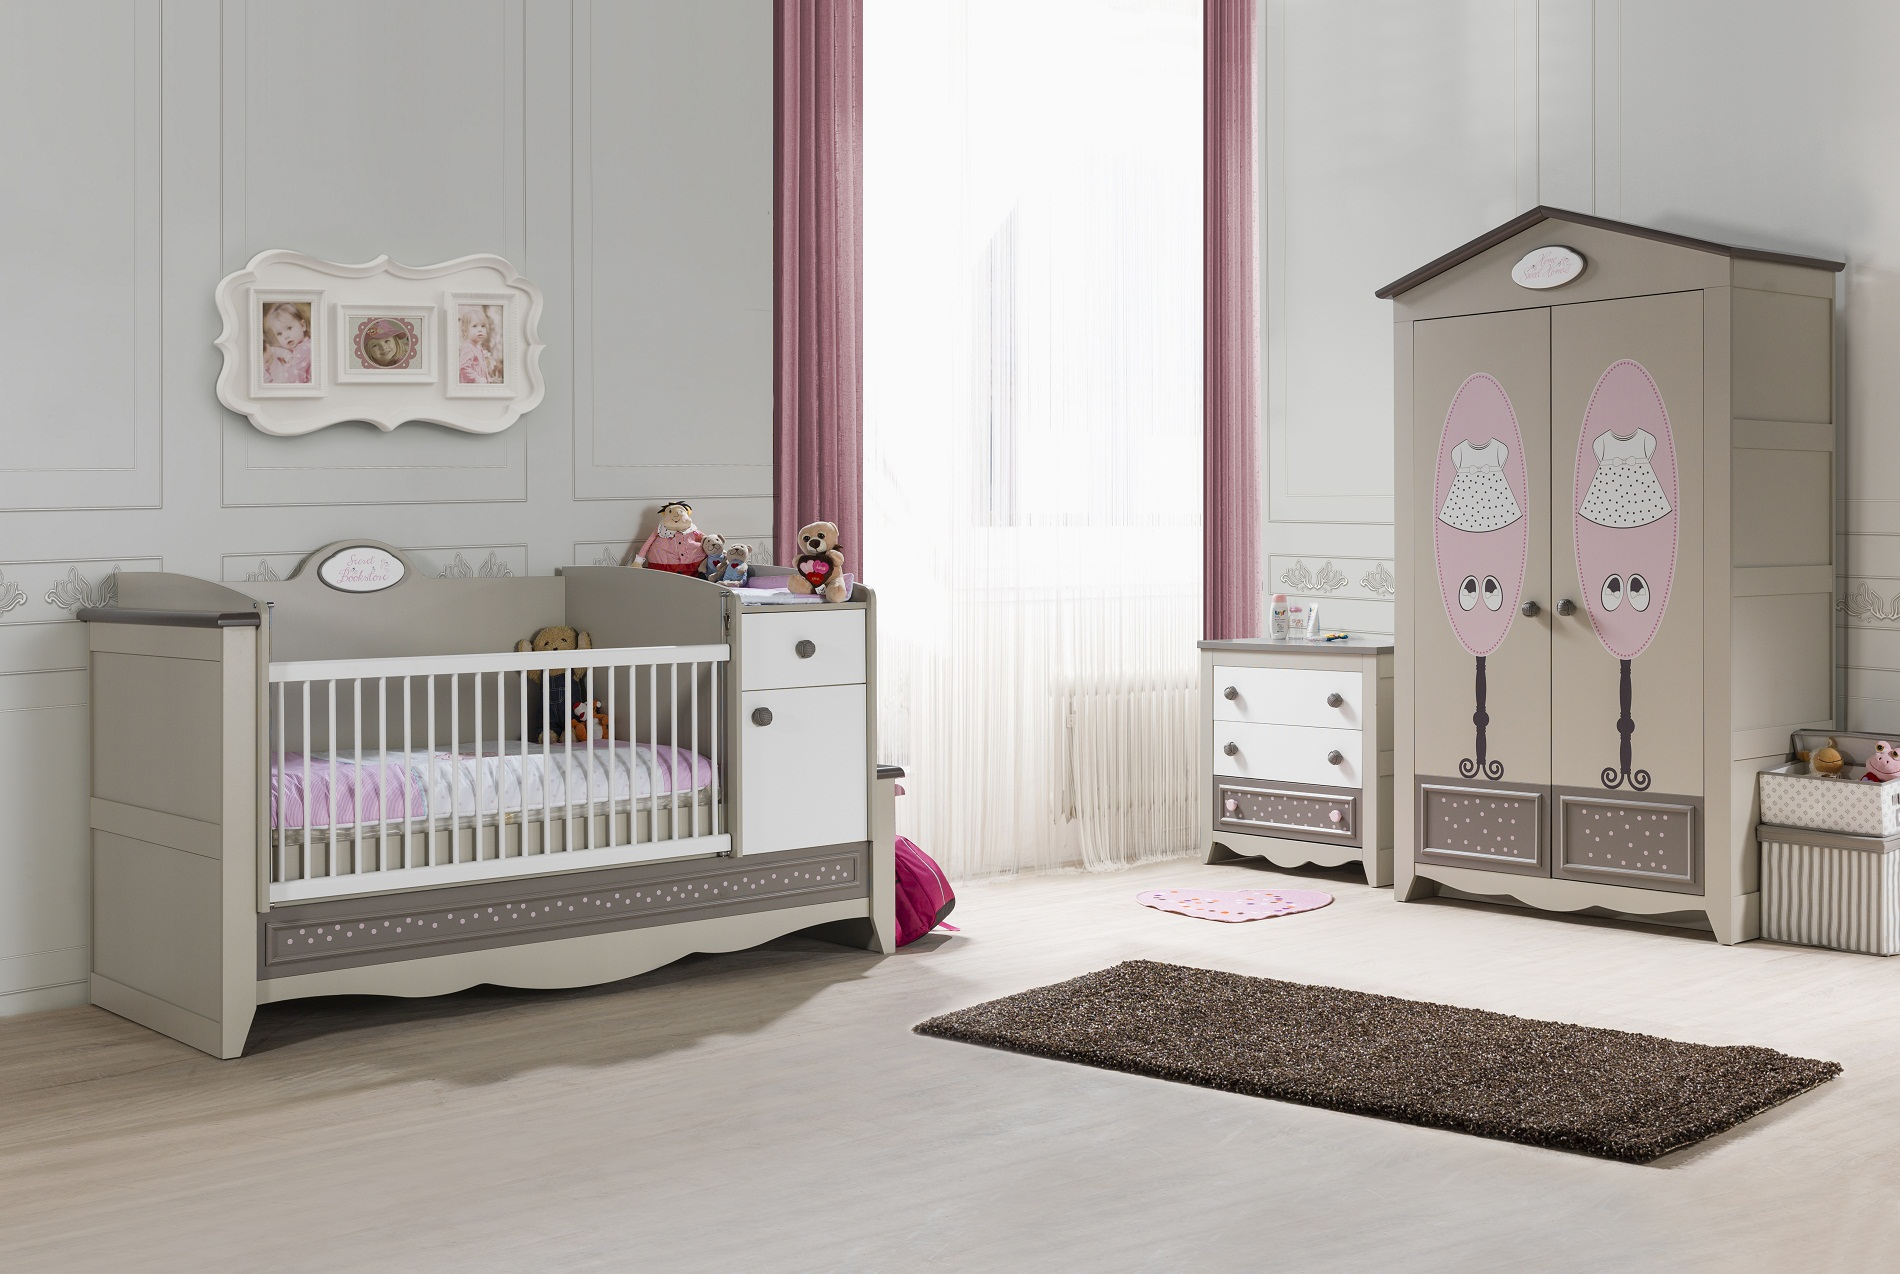 kinderzimmer houses 4 tlg braun weiss boutique schrank 2 trg dac 73004 2 6 8. Black Bedroom Furniture Sets. Home Design Ideas